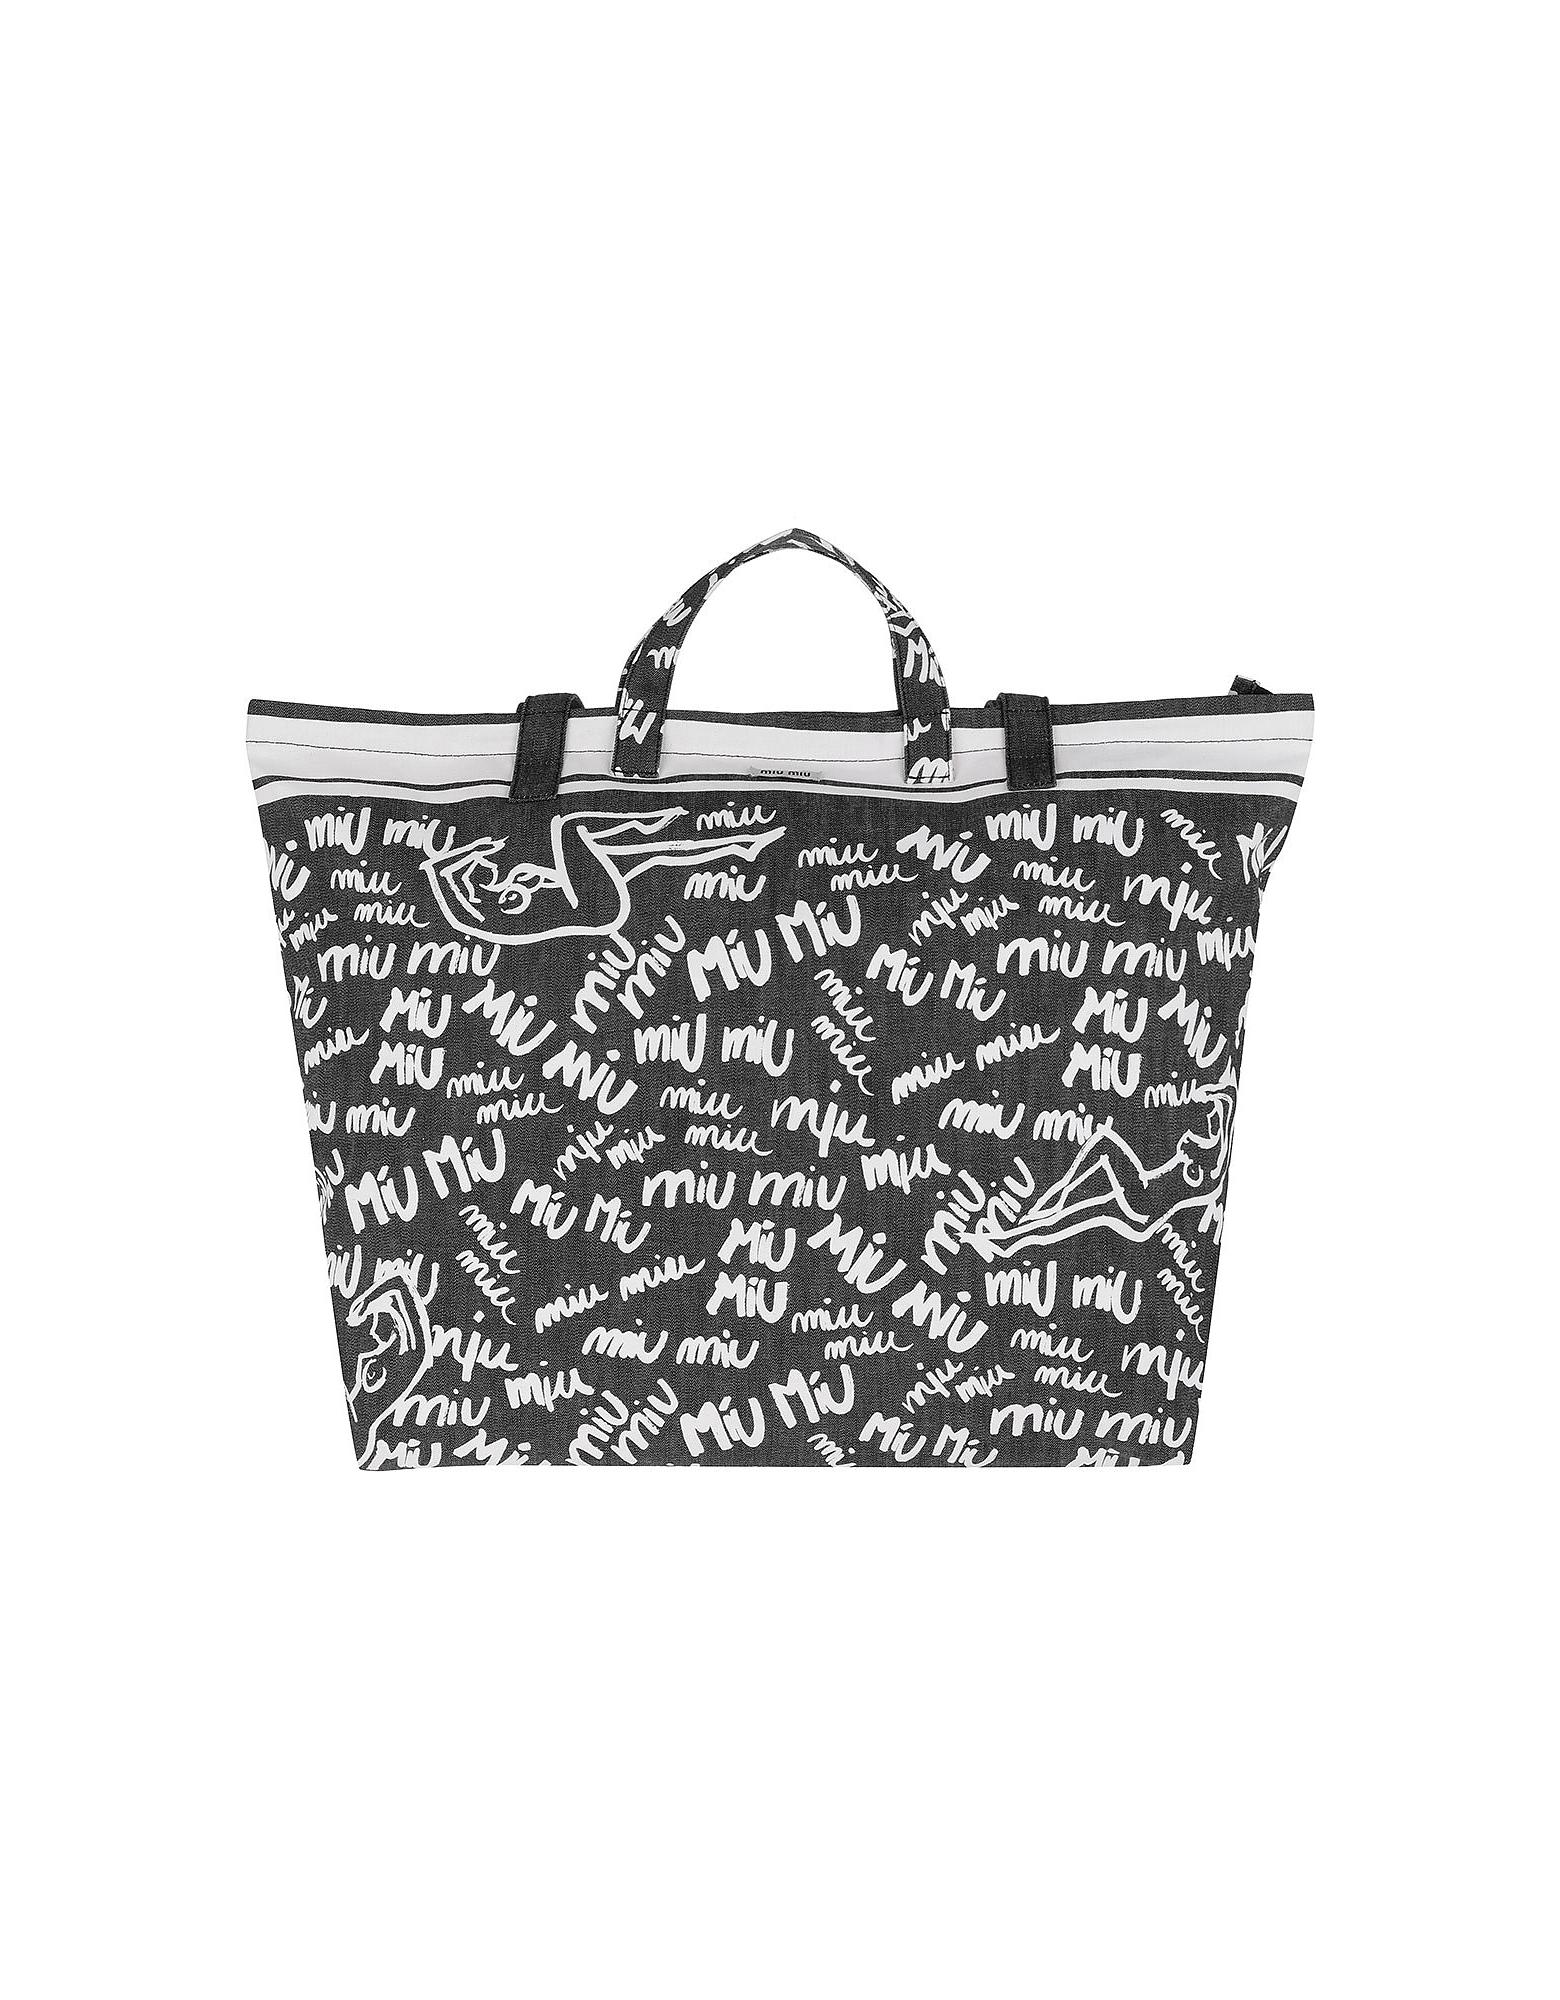 Miu Miu Handbags, Scribble Print Canvas Tote Nero/Bianco